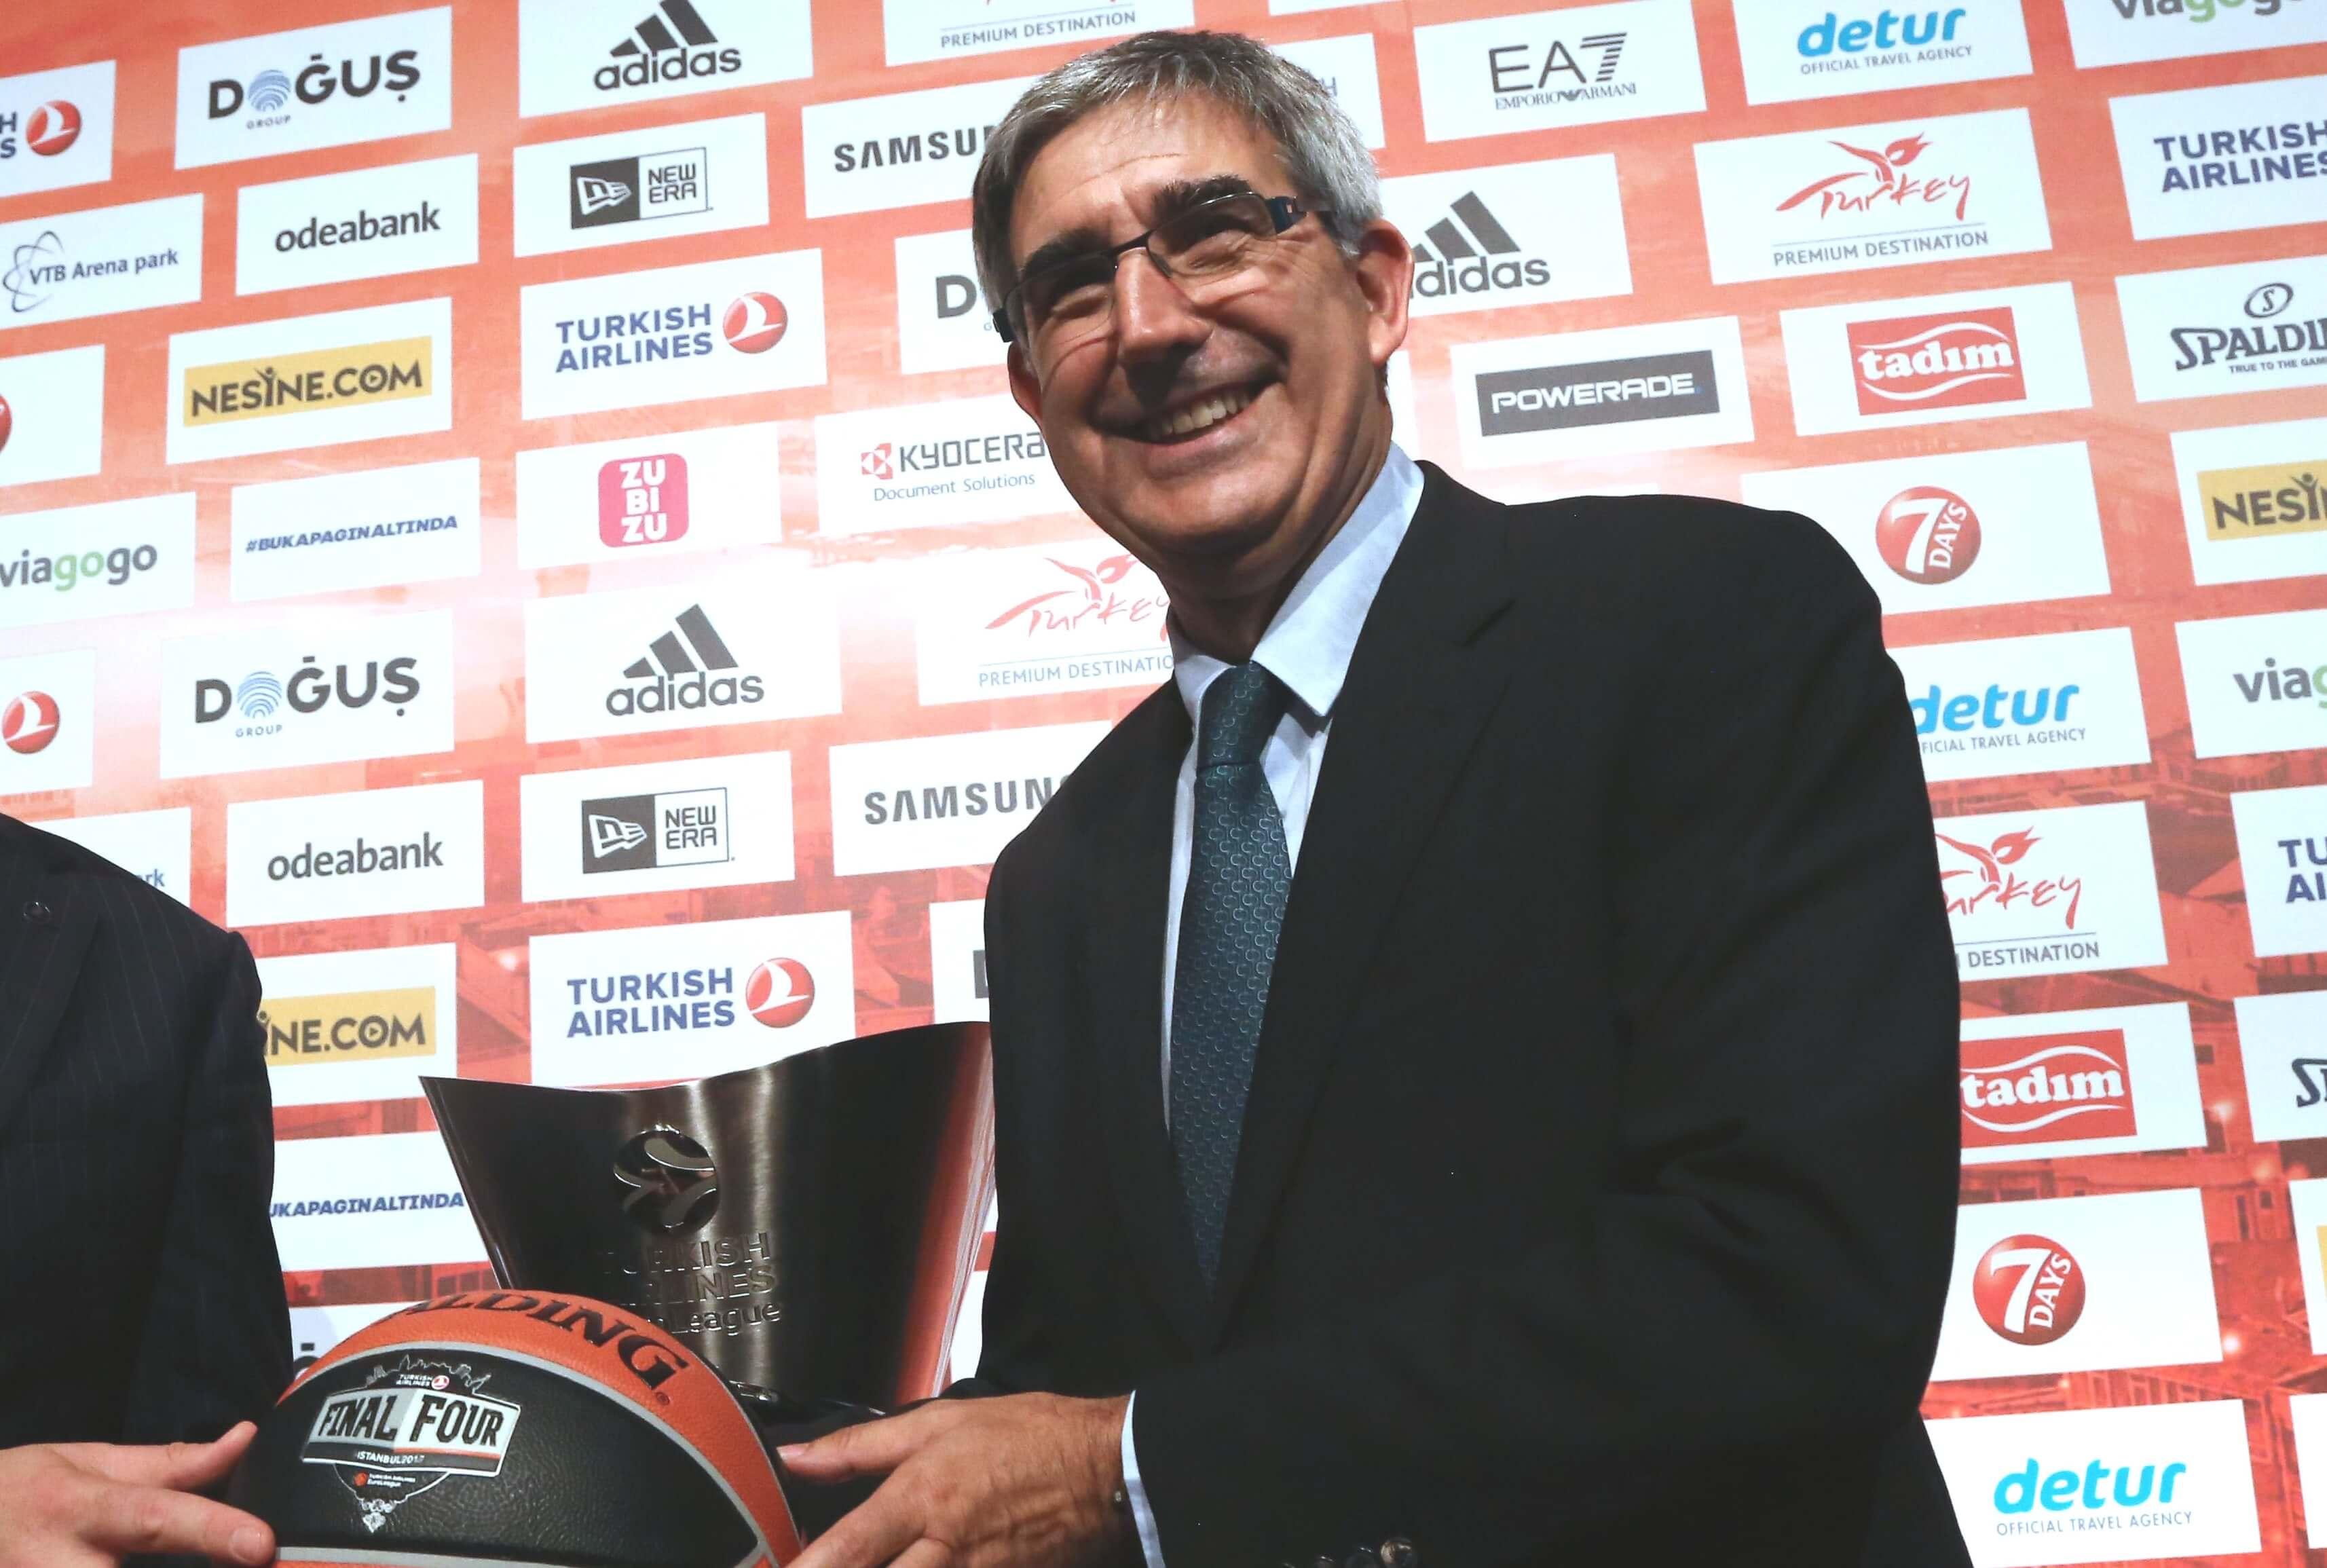 Euroleague: Σήμερα (26/04) η κρίσιμη σύσκεψη για Μπερτομέου